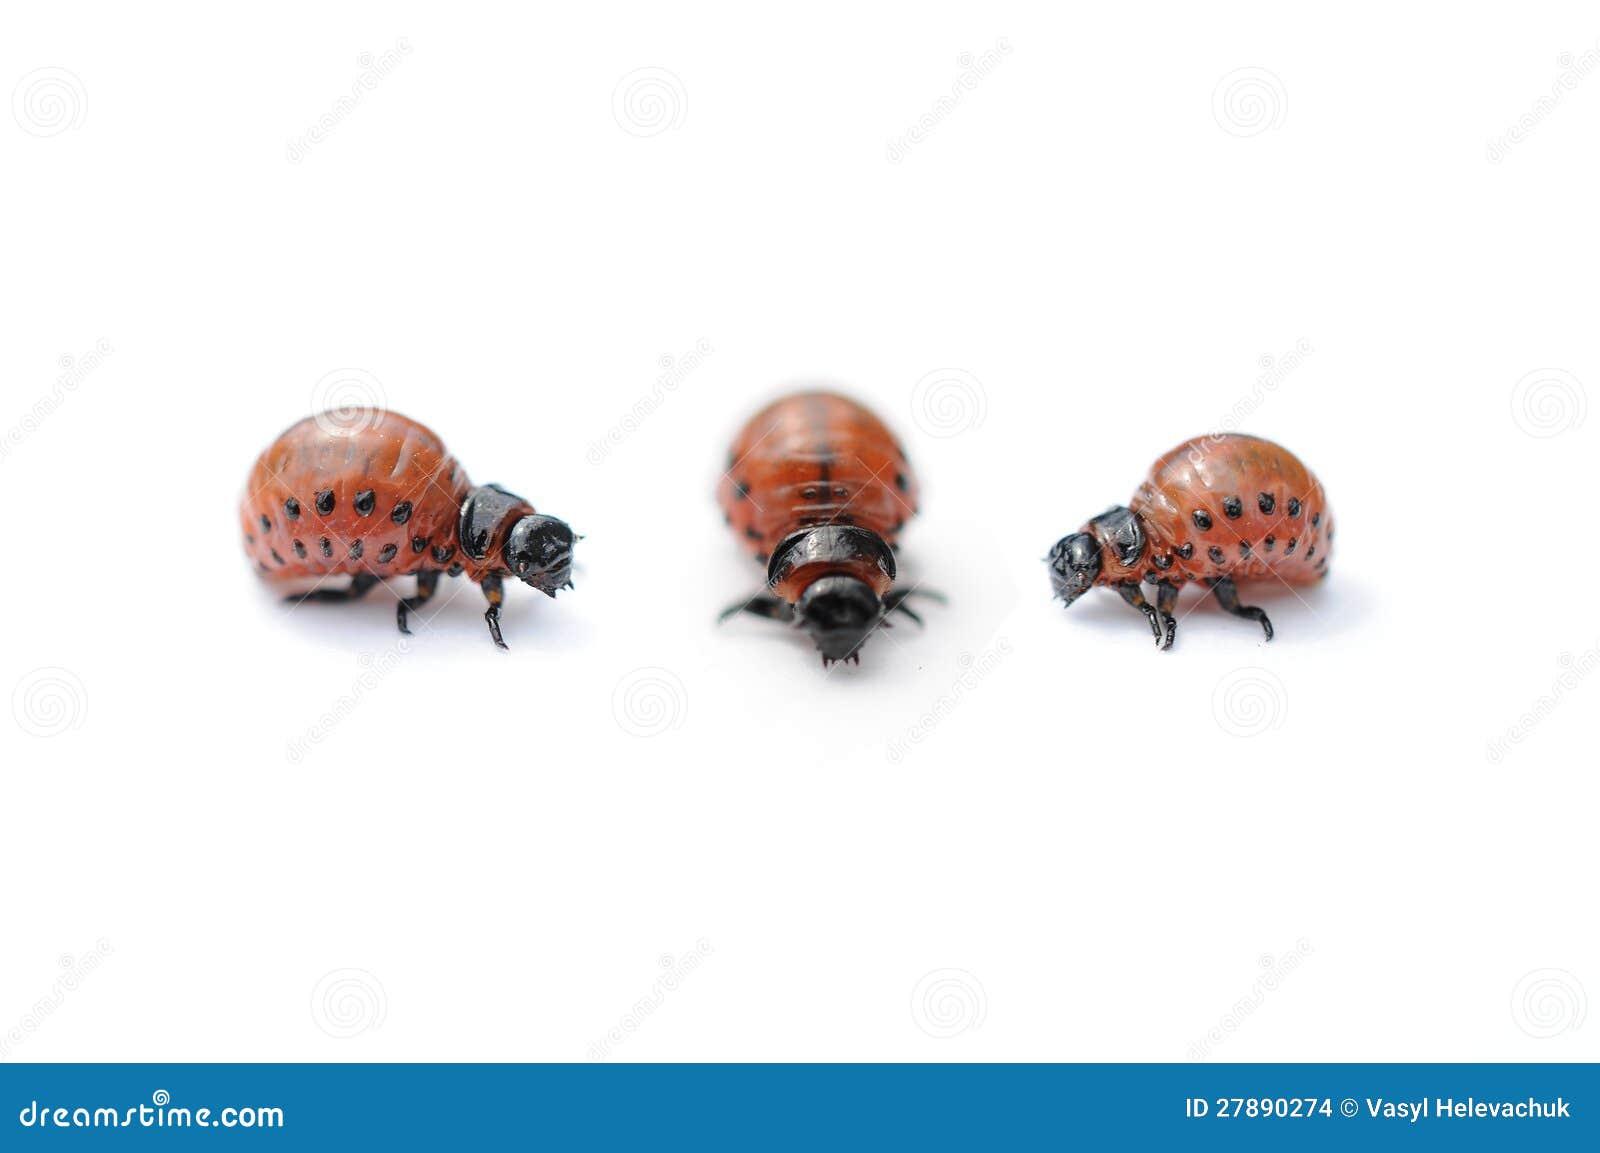 Three Colorado potato bug